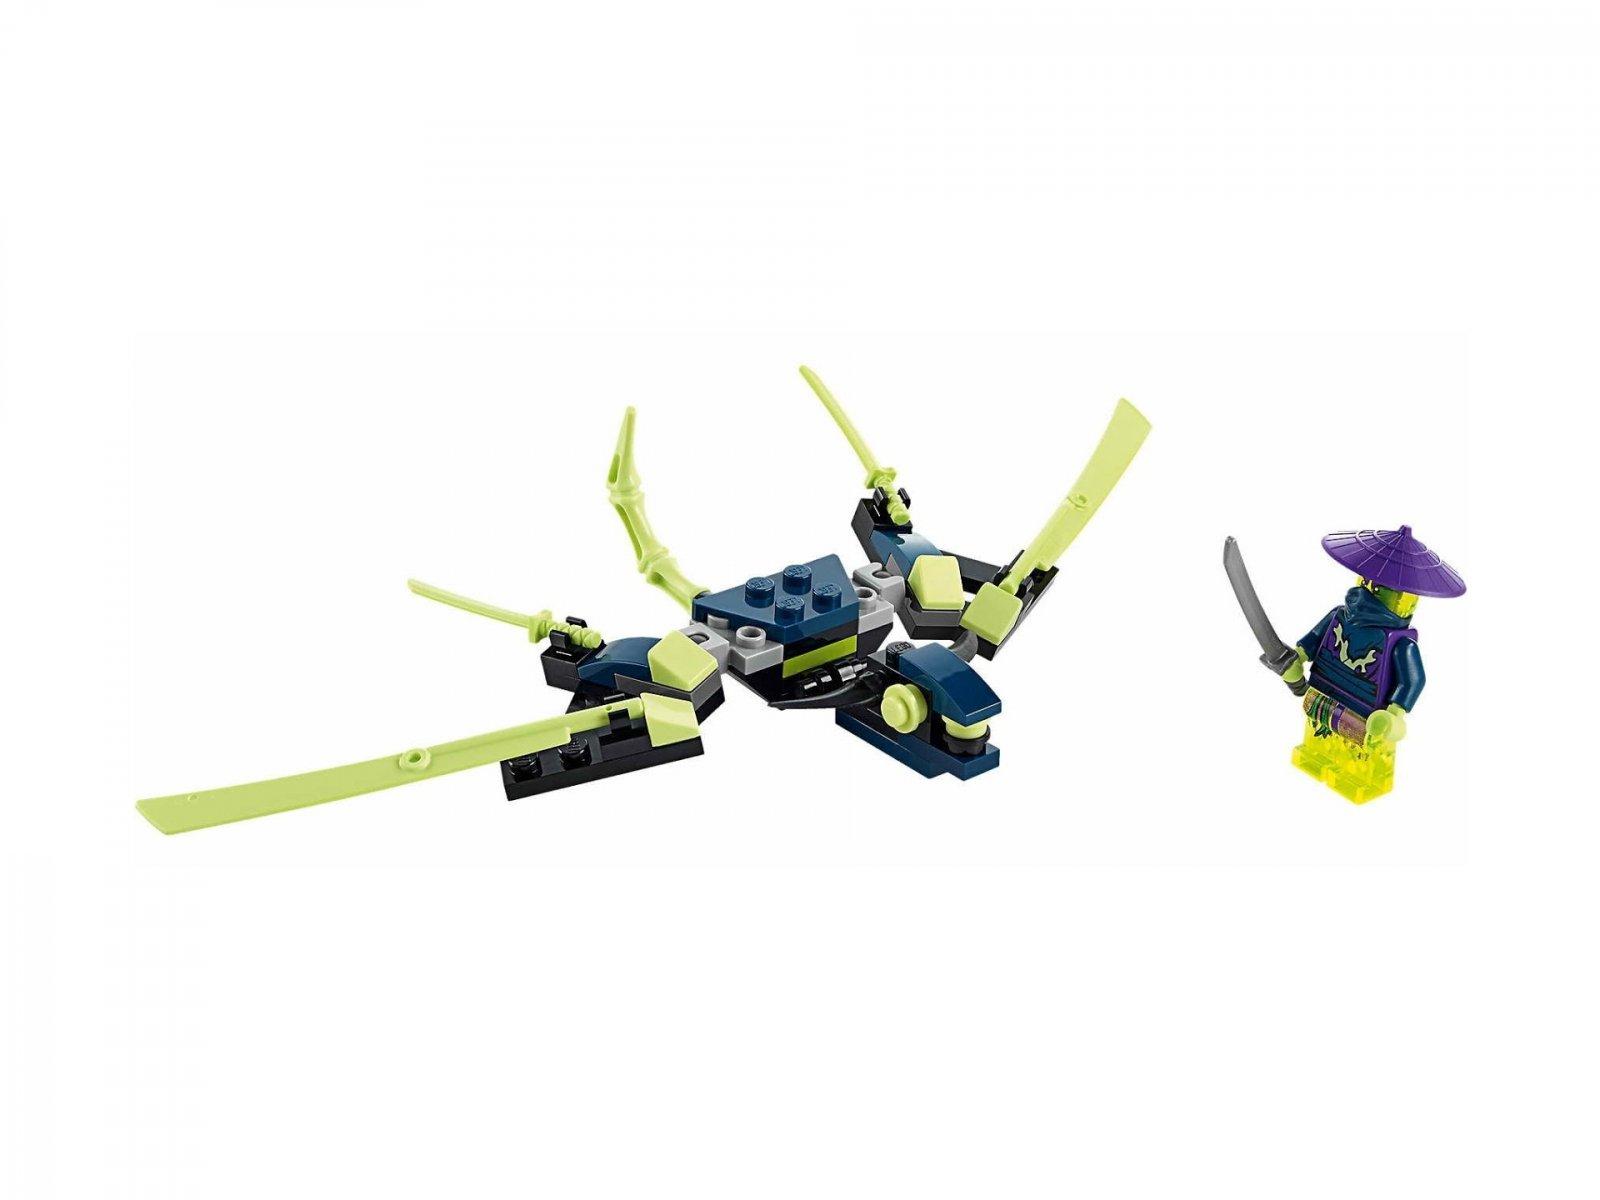 LEGO Ninjago® 30294 The Cowler Dragon